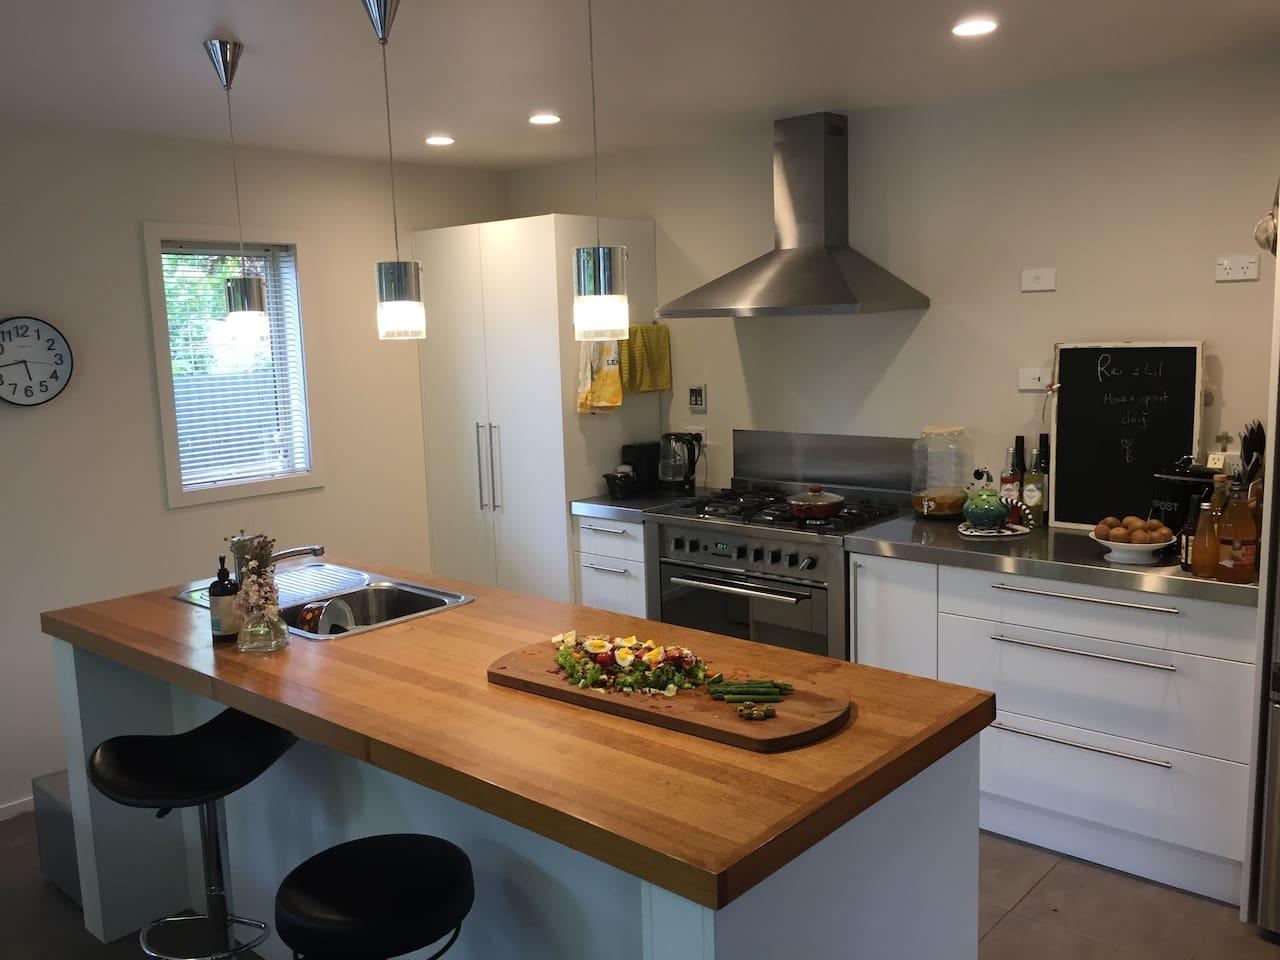 Gas hob dishwasher microwave toaster fridge and feeezer space